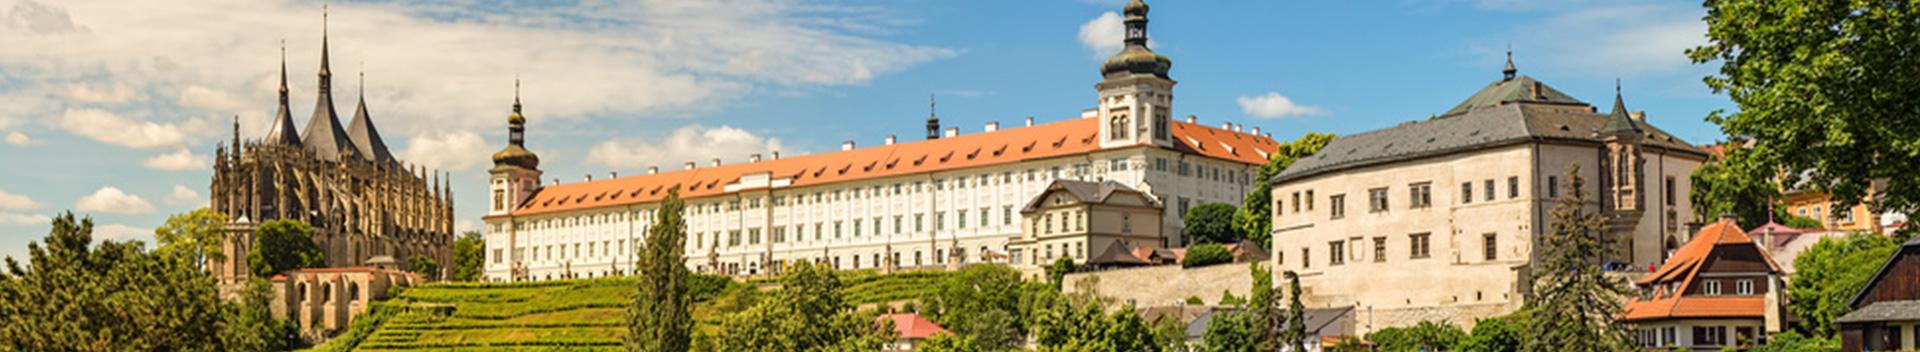 Bone Church & Cesky Krumlov Tours from Prague